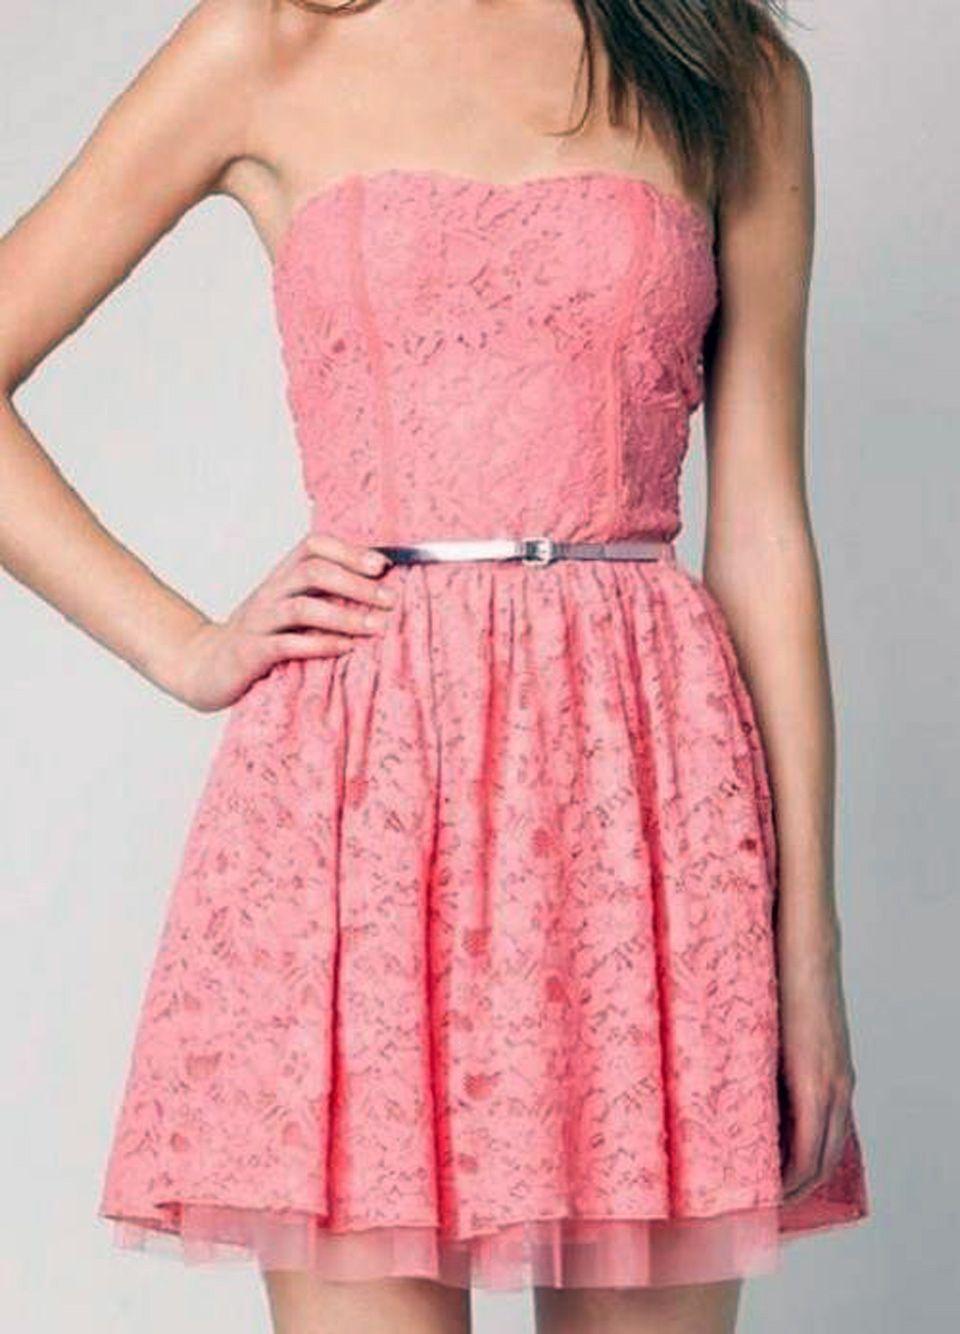 dresses tumblr - Căutare Google | Dresses ❤ | Pinterest